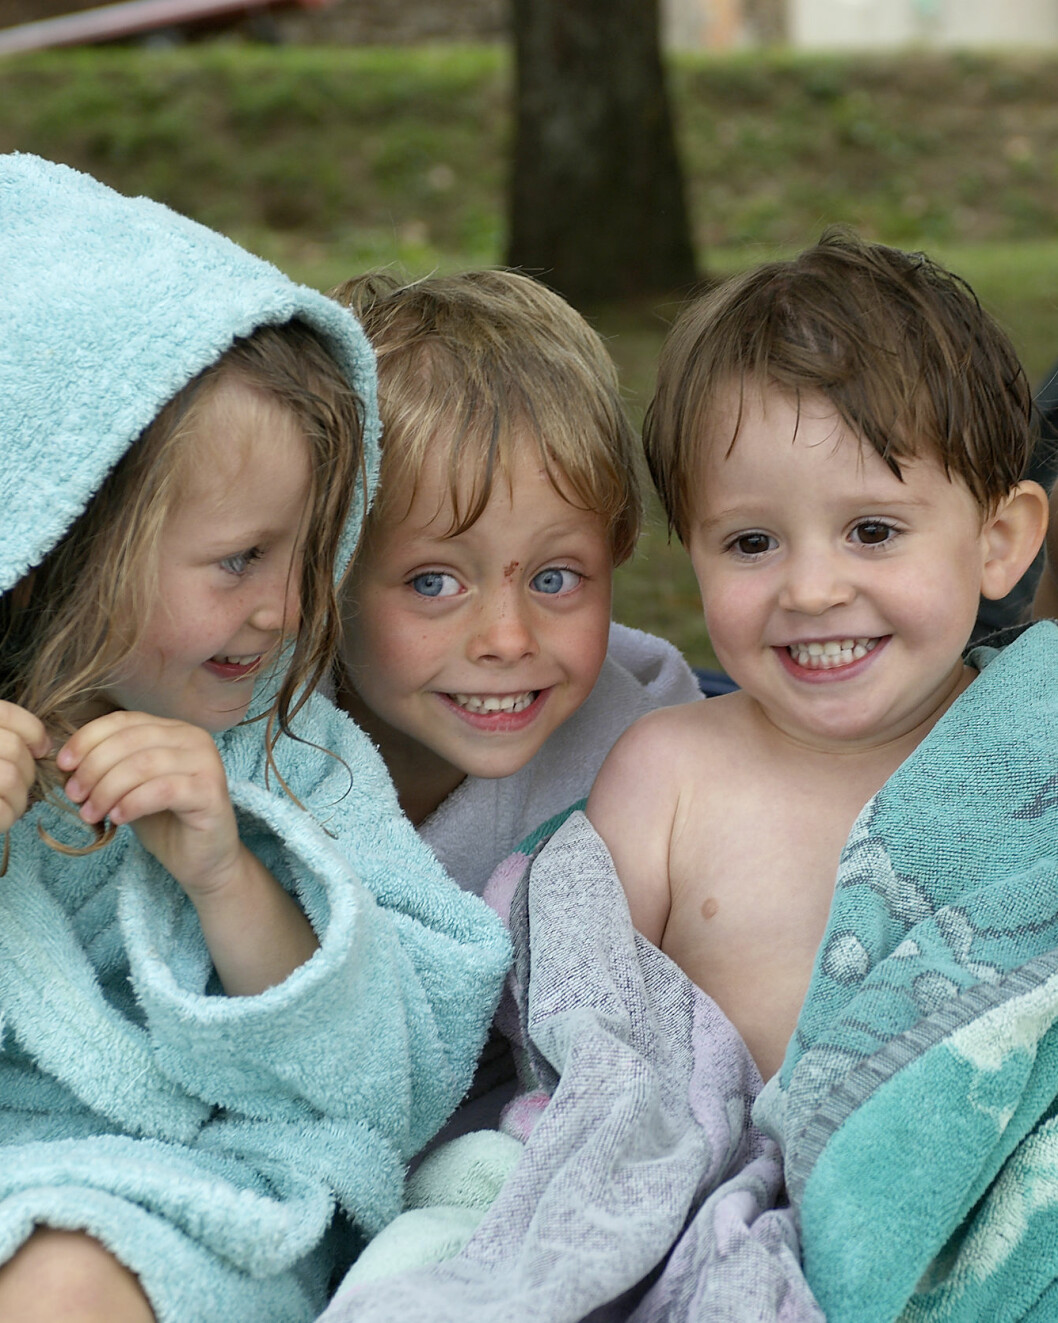 ©Bettina Brinkmann/MAXPPP - Berry/Indre, le 15/08/2005  -  ILLUSTRATION enfants    ****AUTORISATION OK**** Foto: MAXPPP